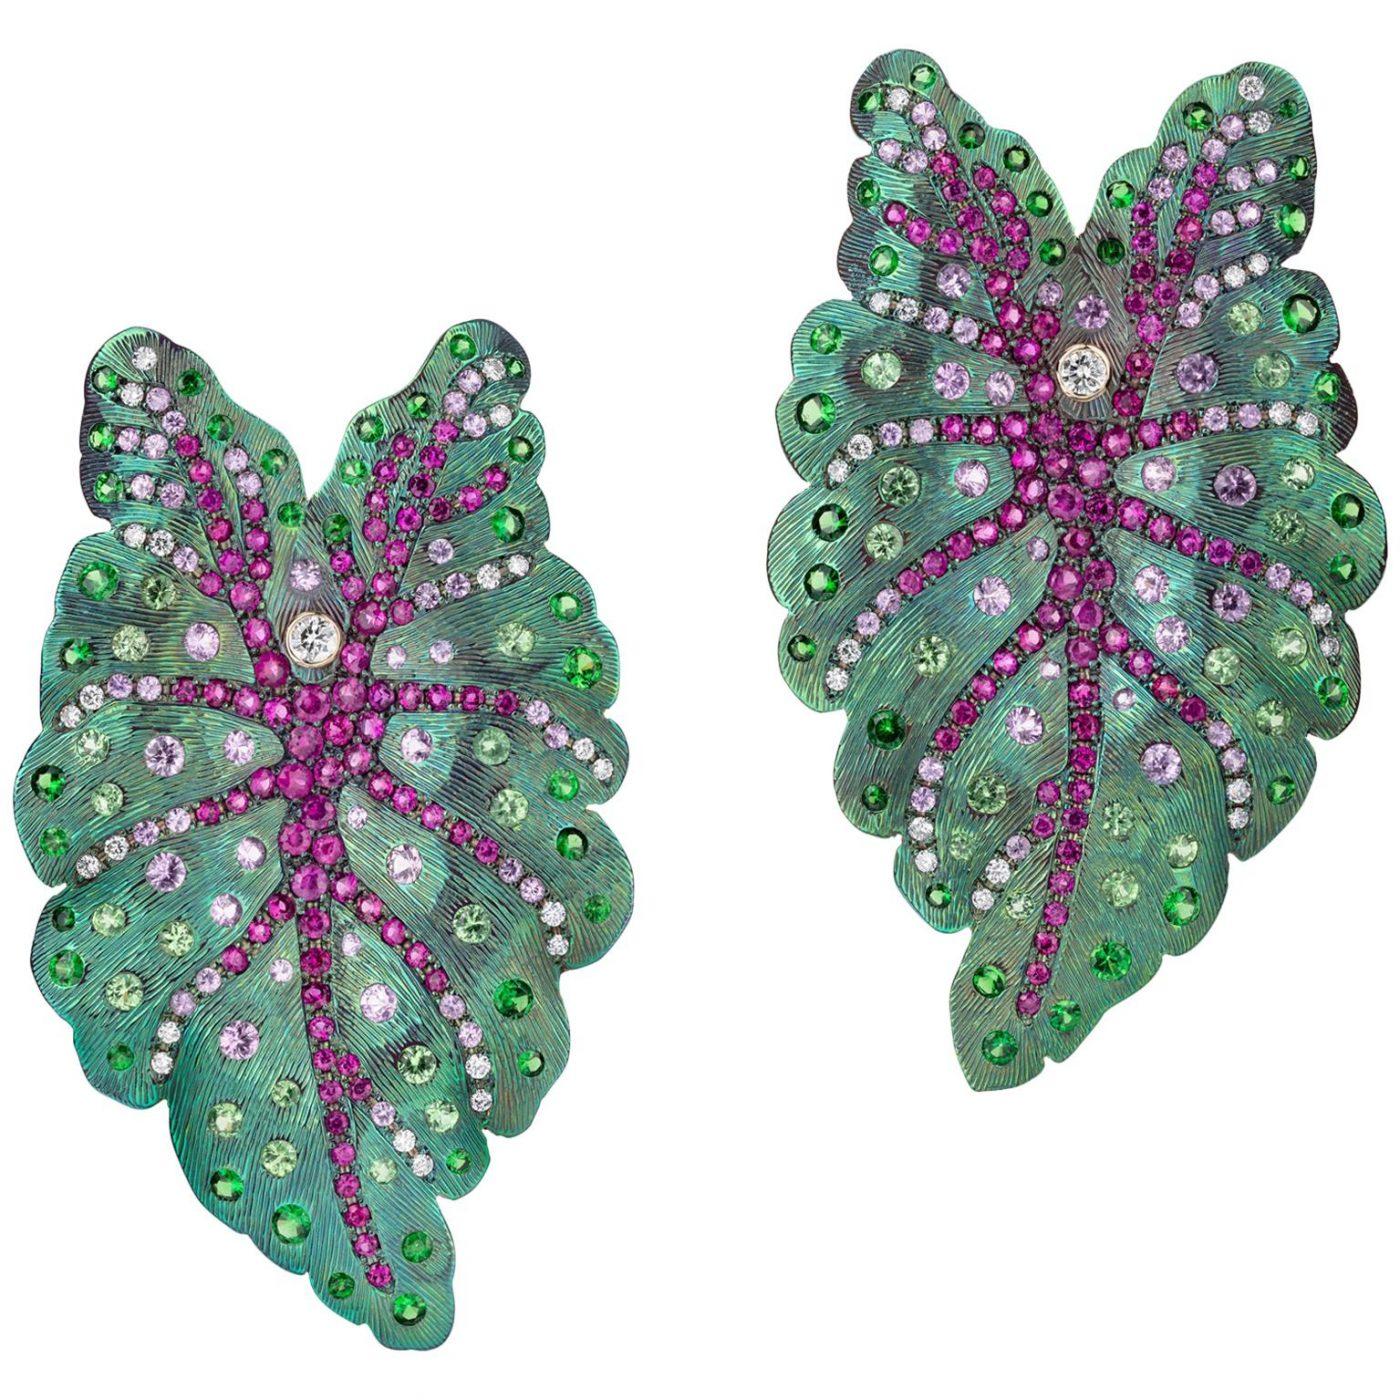 Sabbadini Contemporary Titanium Leaf Earrings